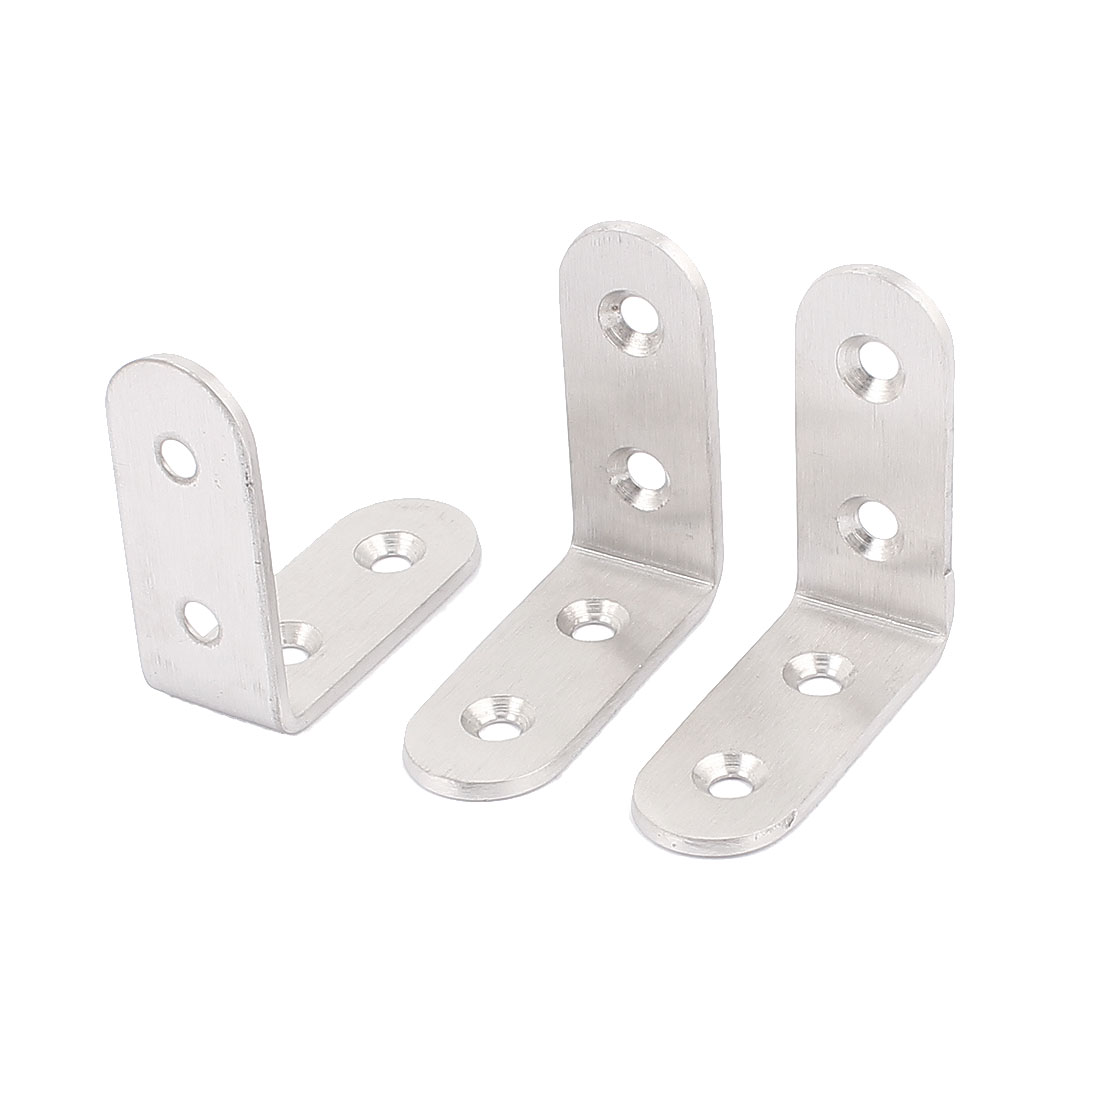 3Pcs L Shape Shelf Support Corner Brace Joint Metal Angle Bracket 50mm x 50mm